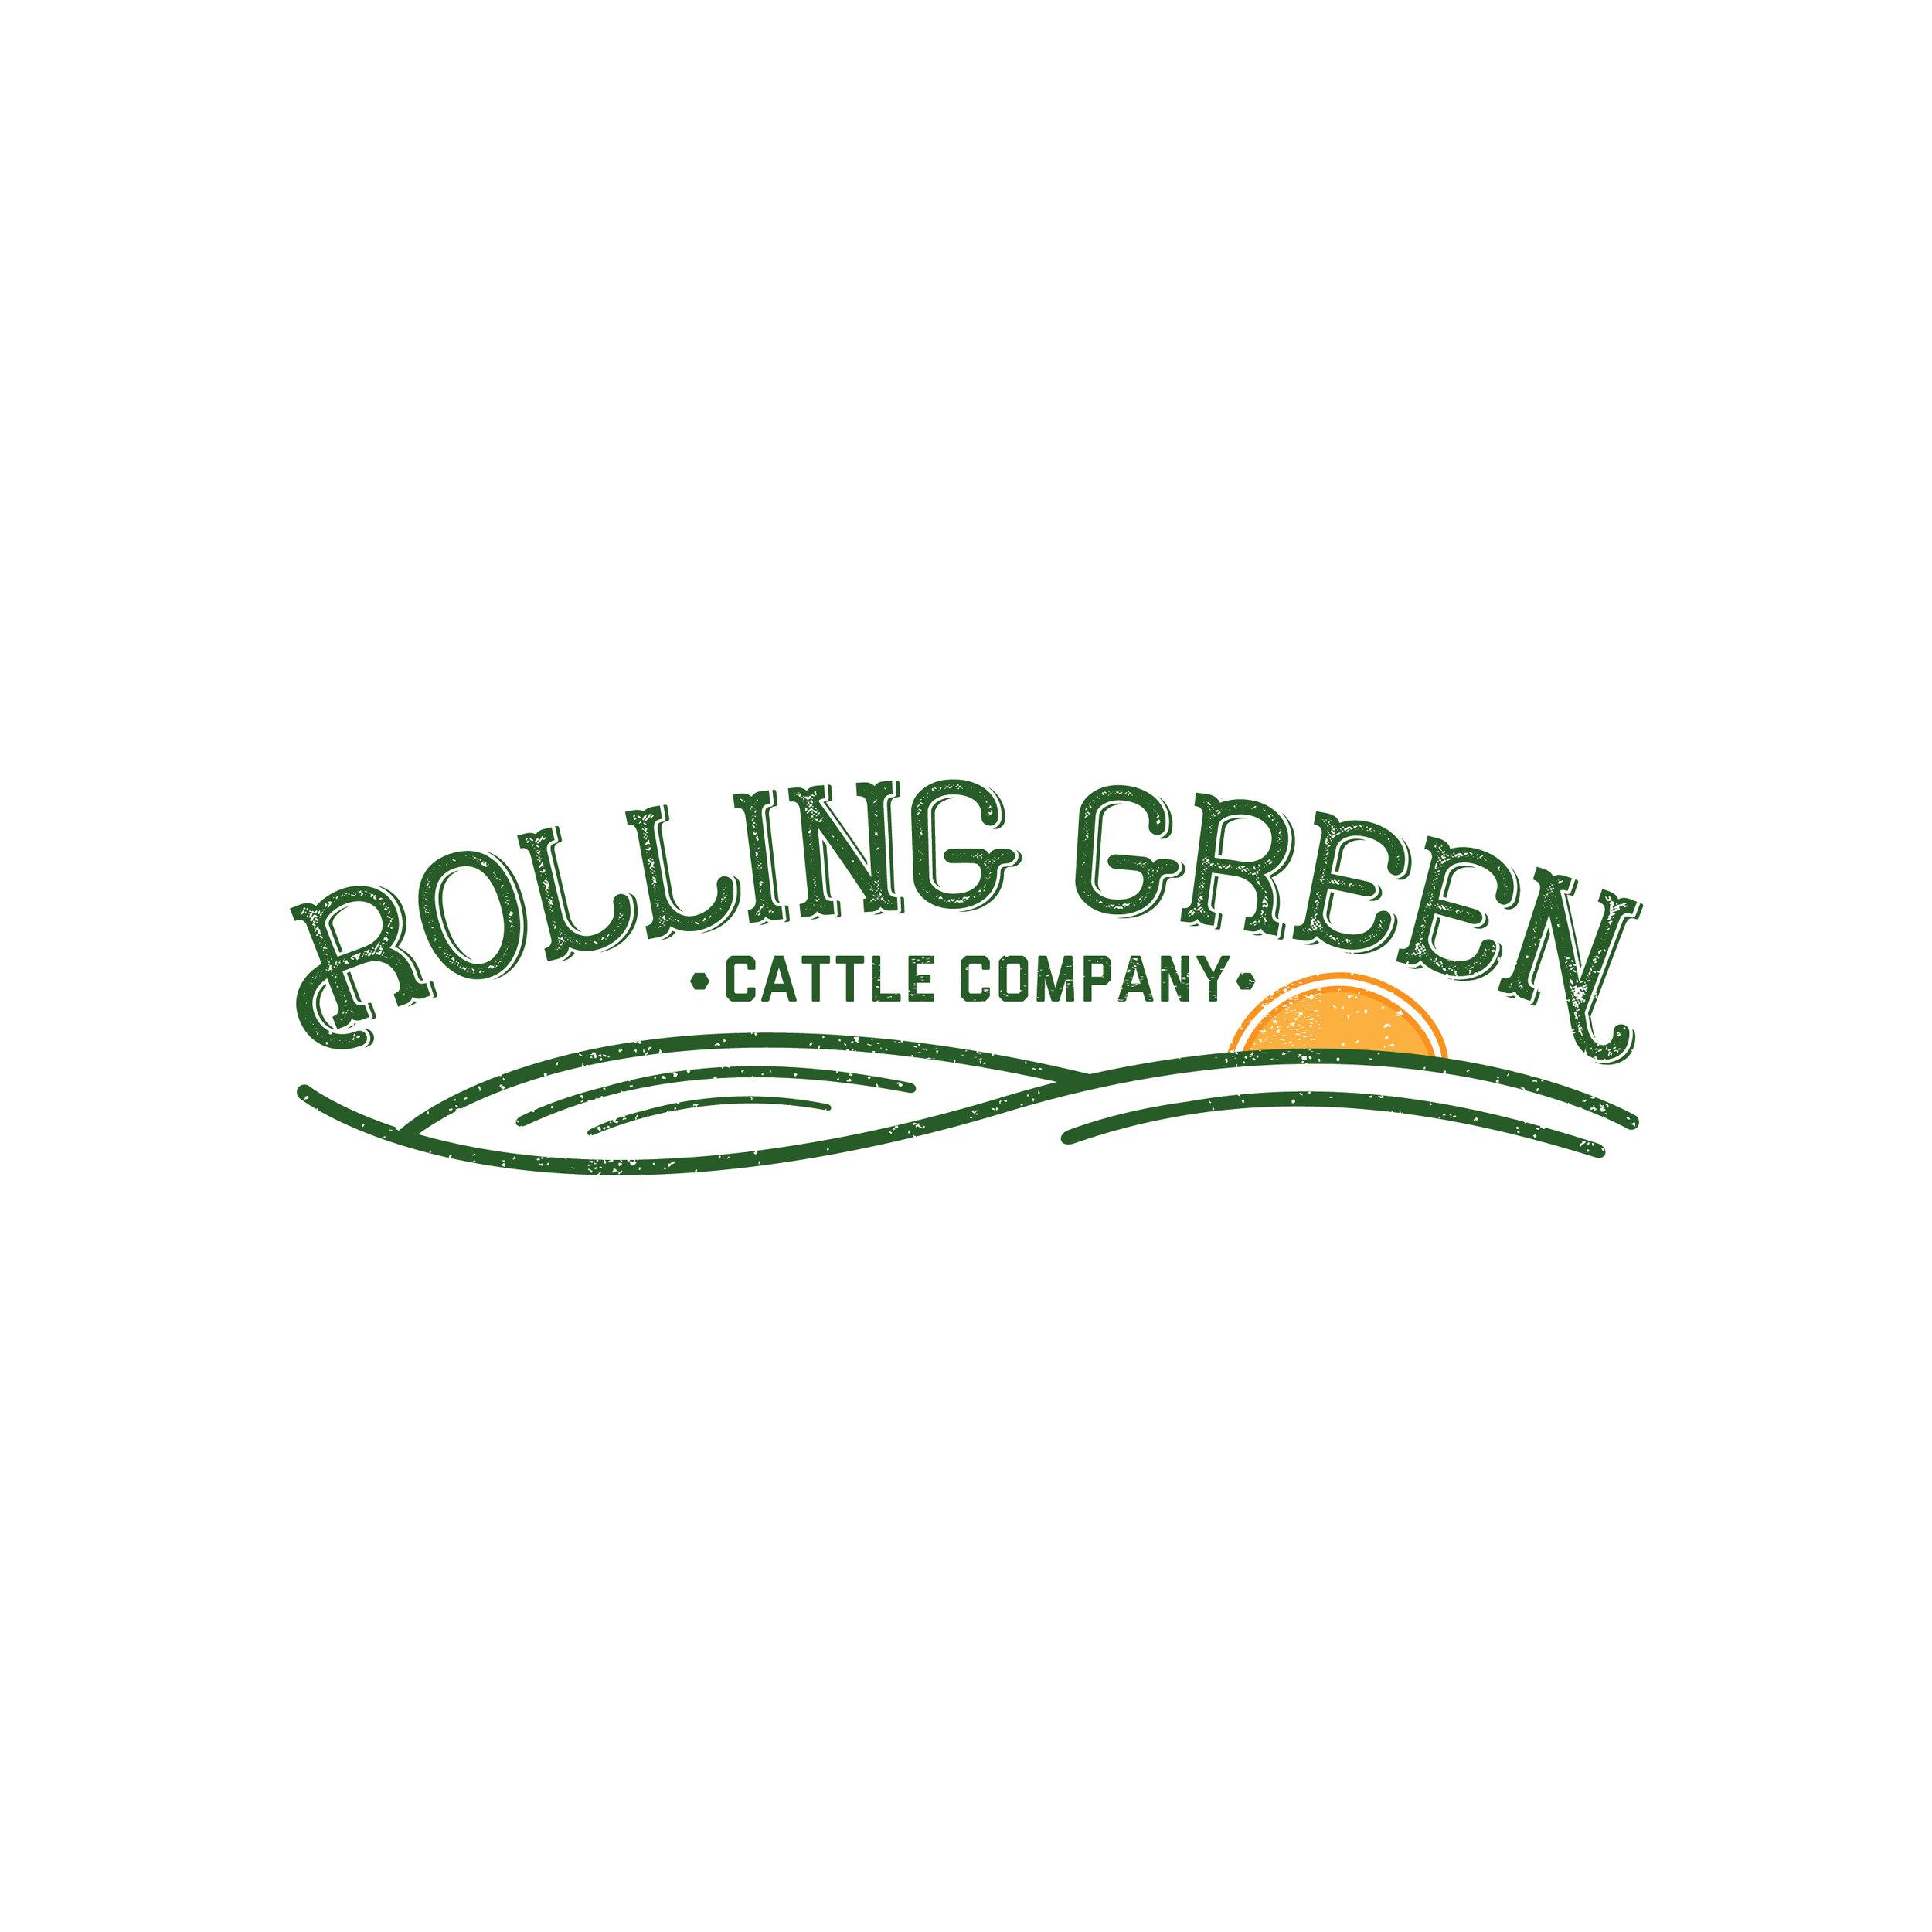 RollingGreen7.jpg